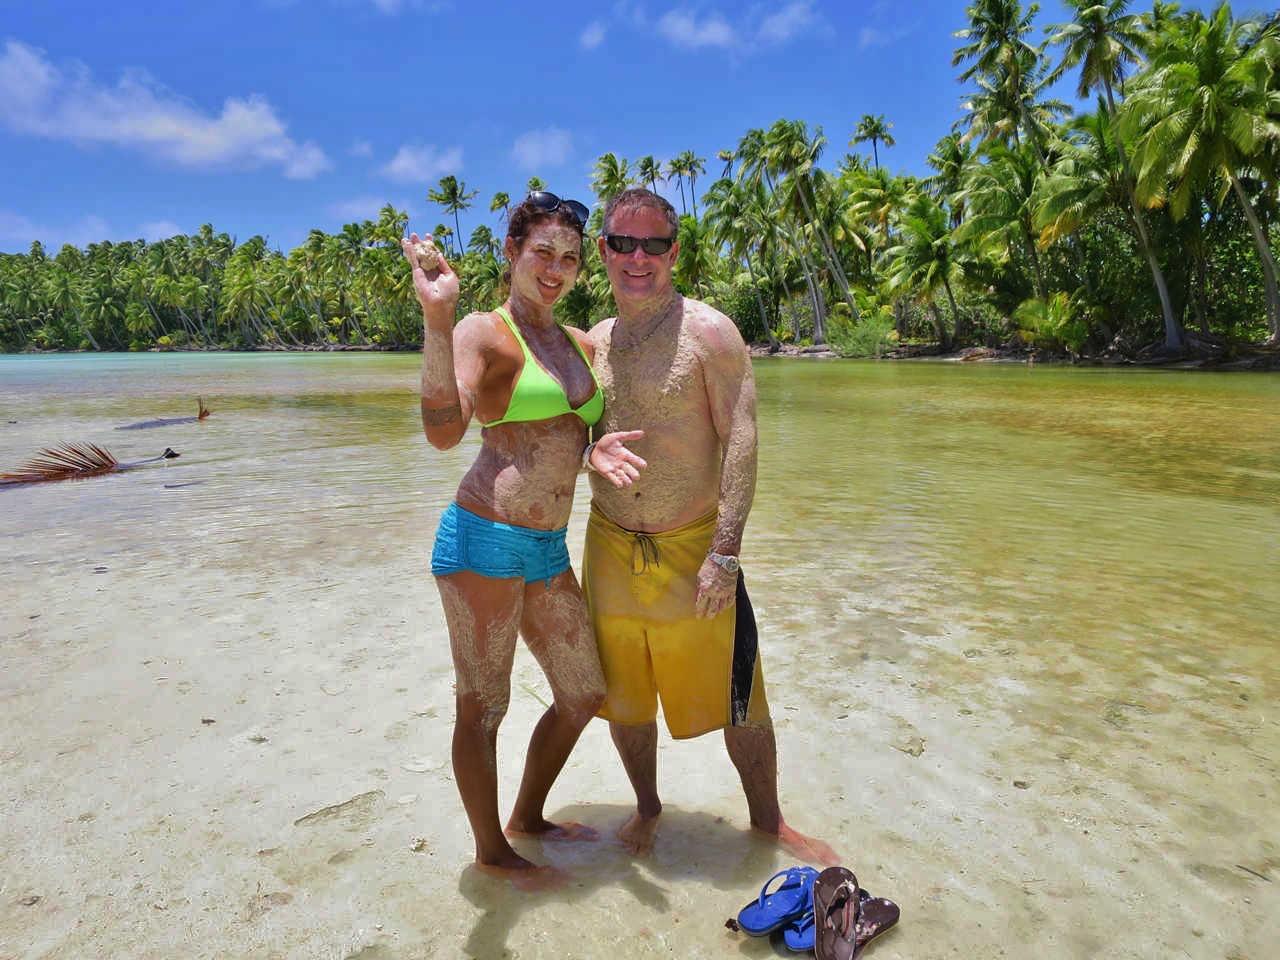 Tumi, Marlon Brando's grand daughter and Eric taking a mud bath at Motu Oroatera